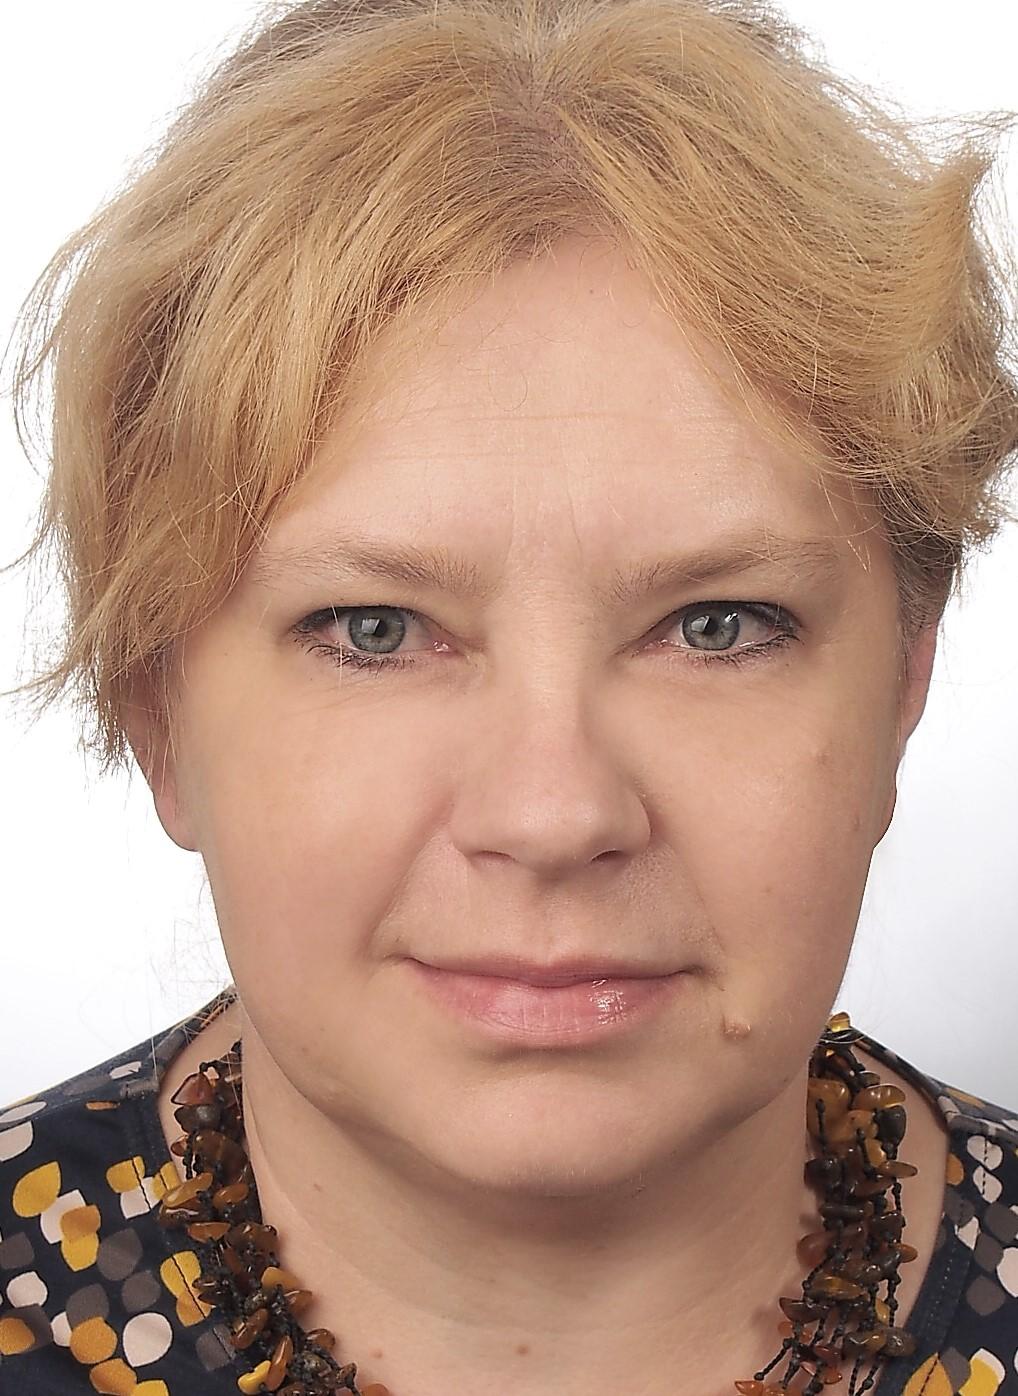 dr hab. Halina Pawłowska-Jaroń, prof. UP